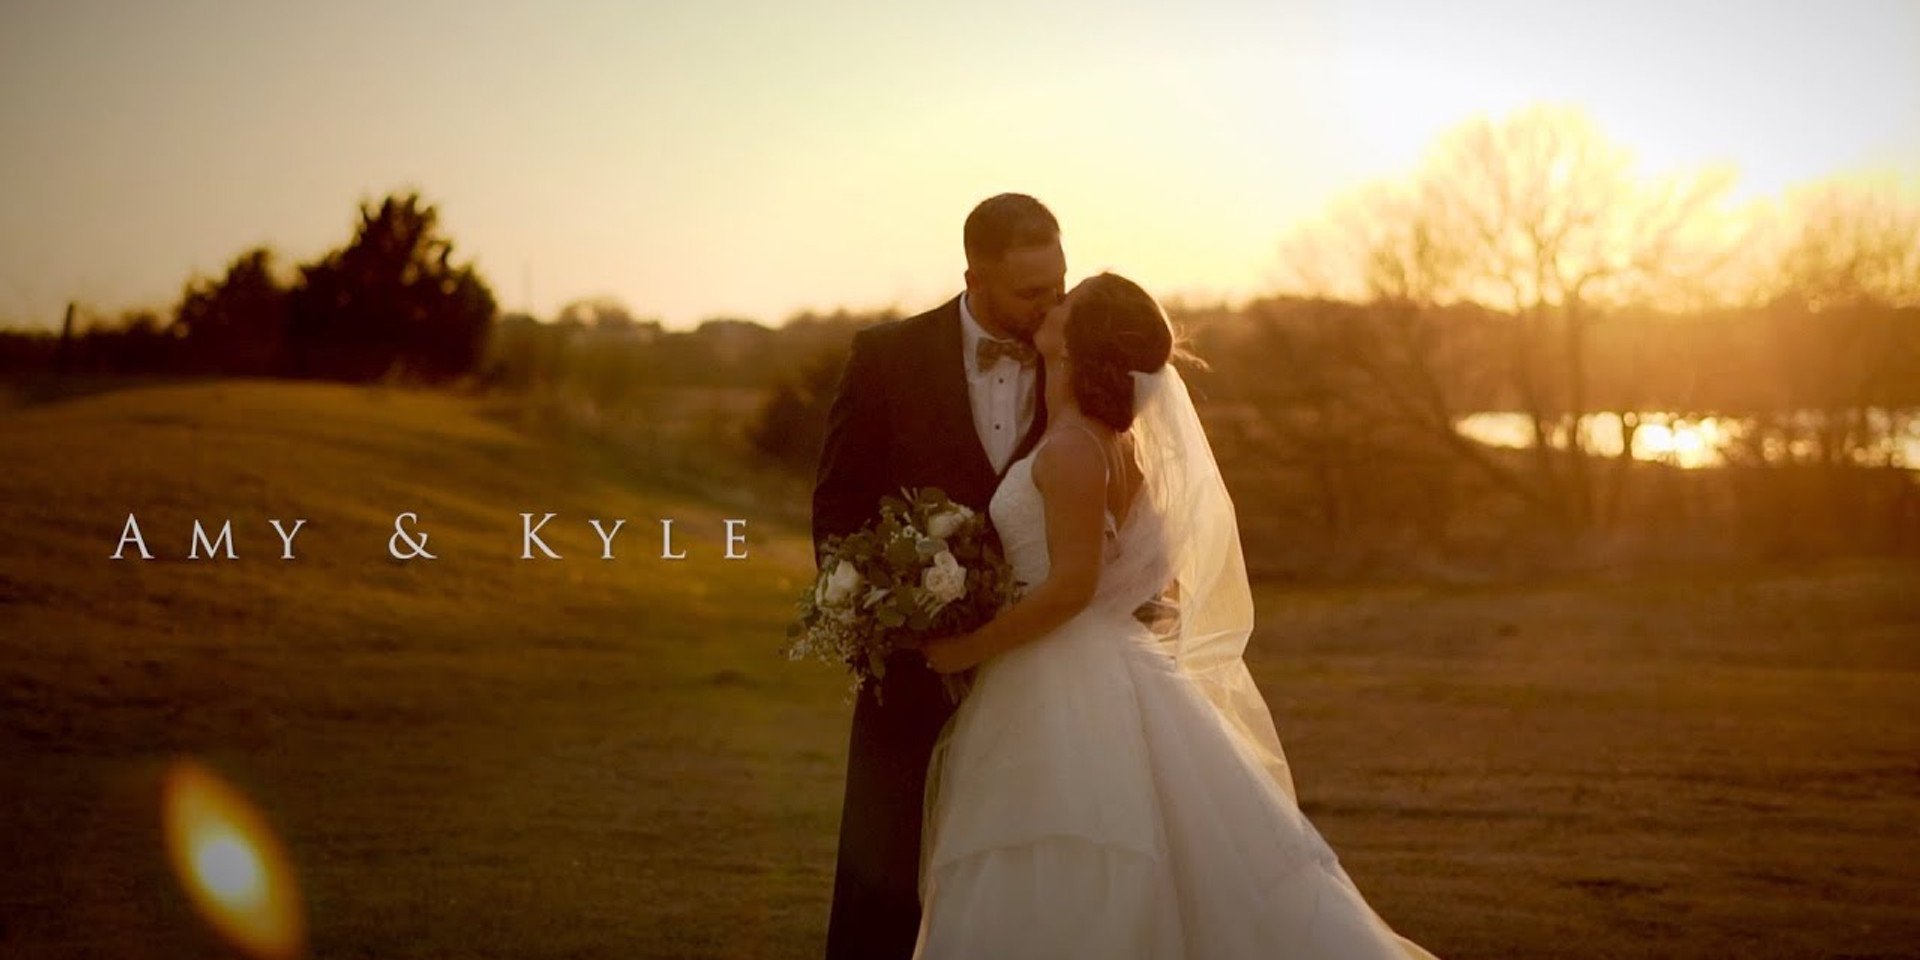 Amy & Kyle